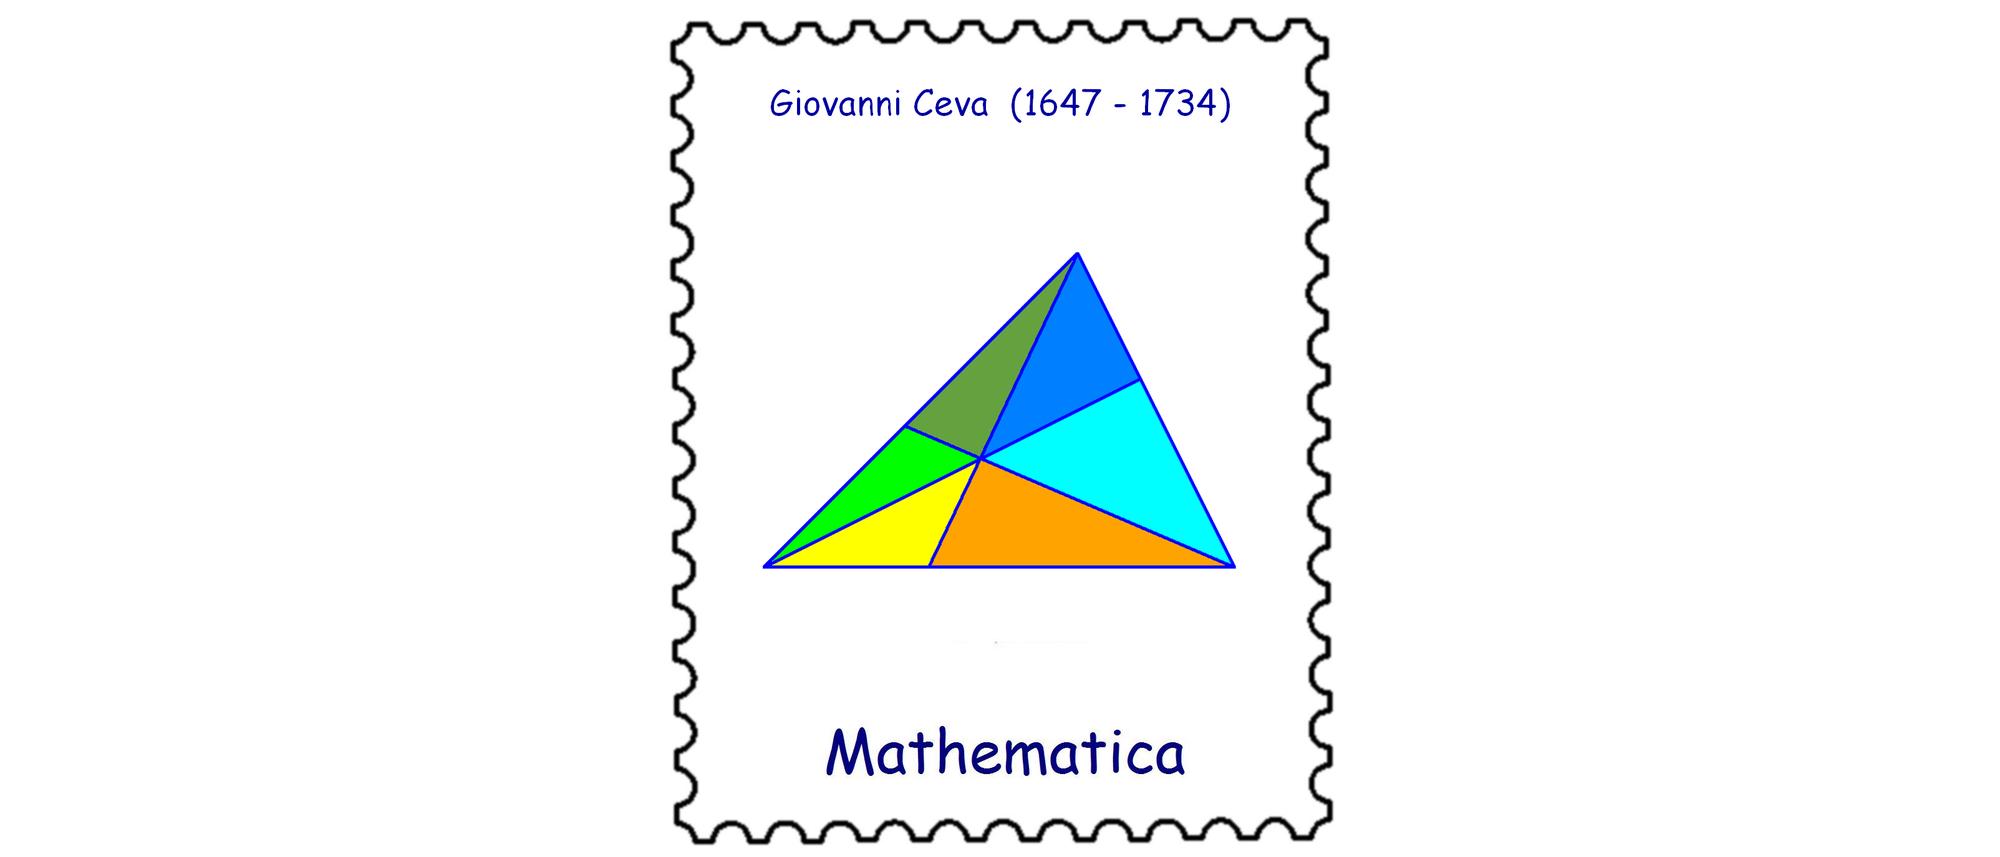 Briefmarke Ceva